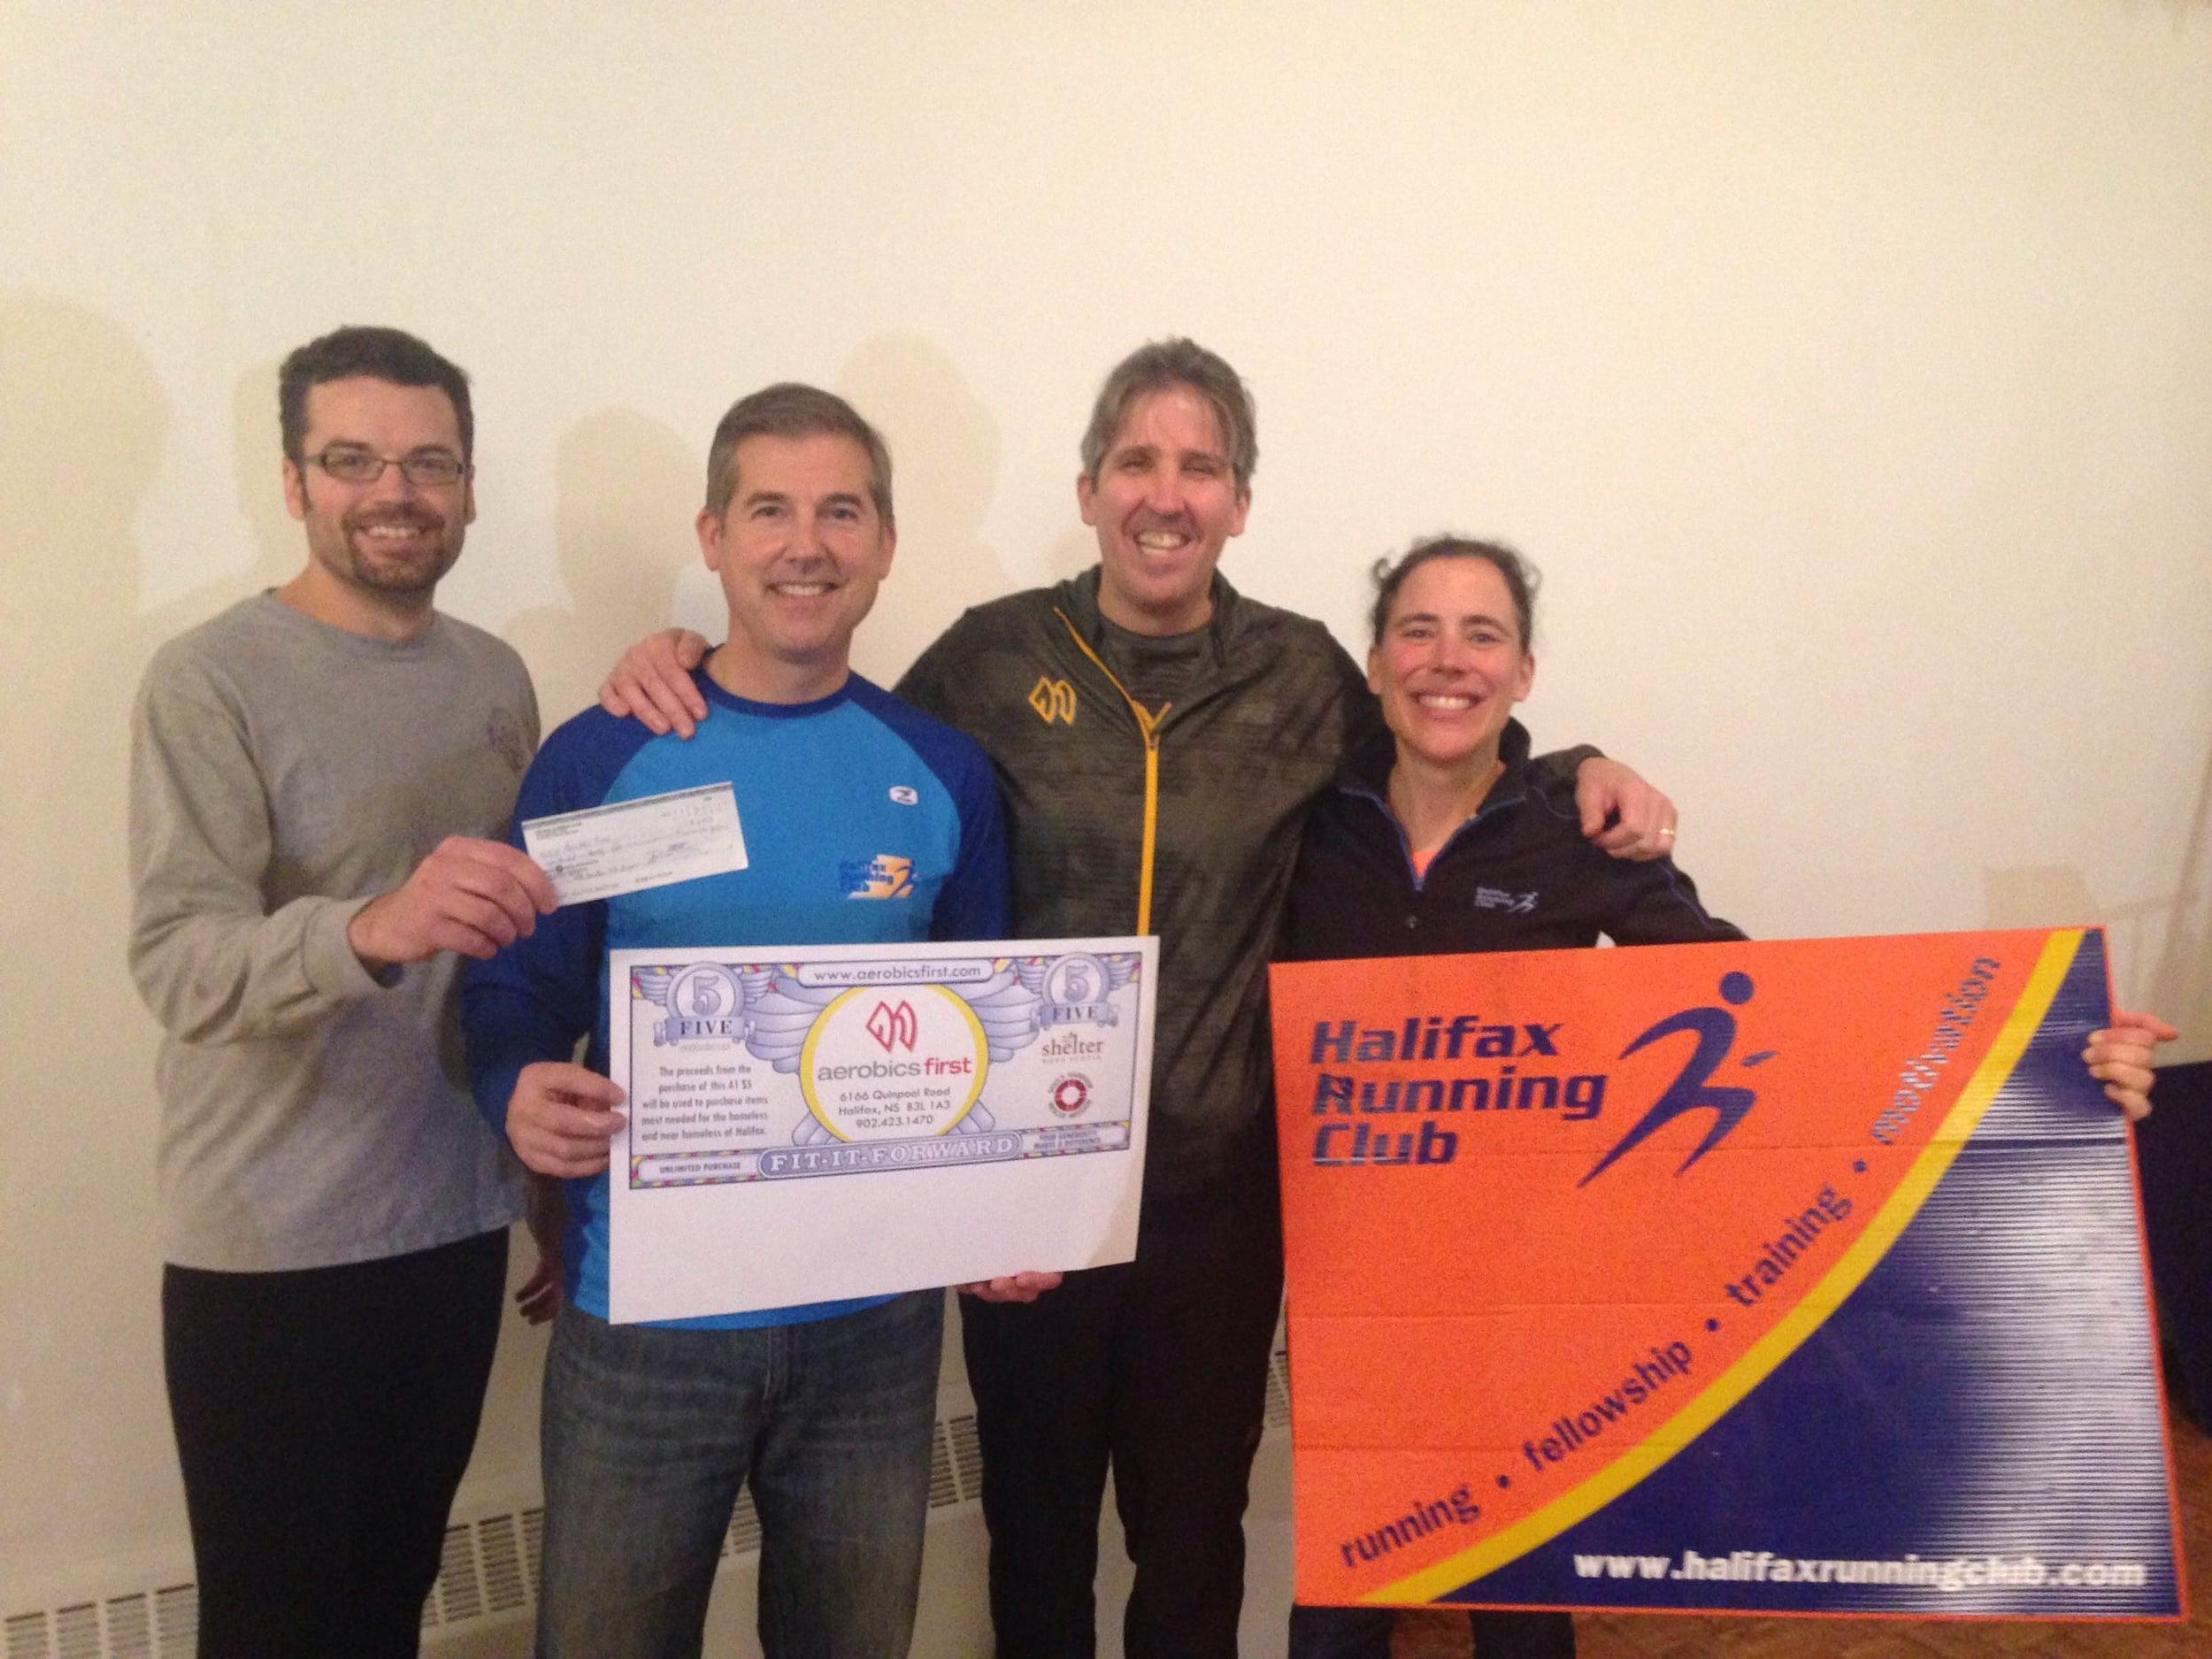 Nick McBride, Mark Pothier and Marie-Claude Gregoire present cheque to Luke MacDonald.